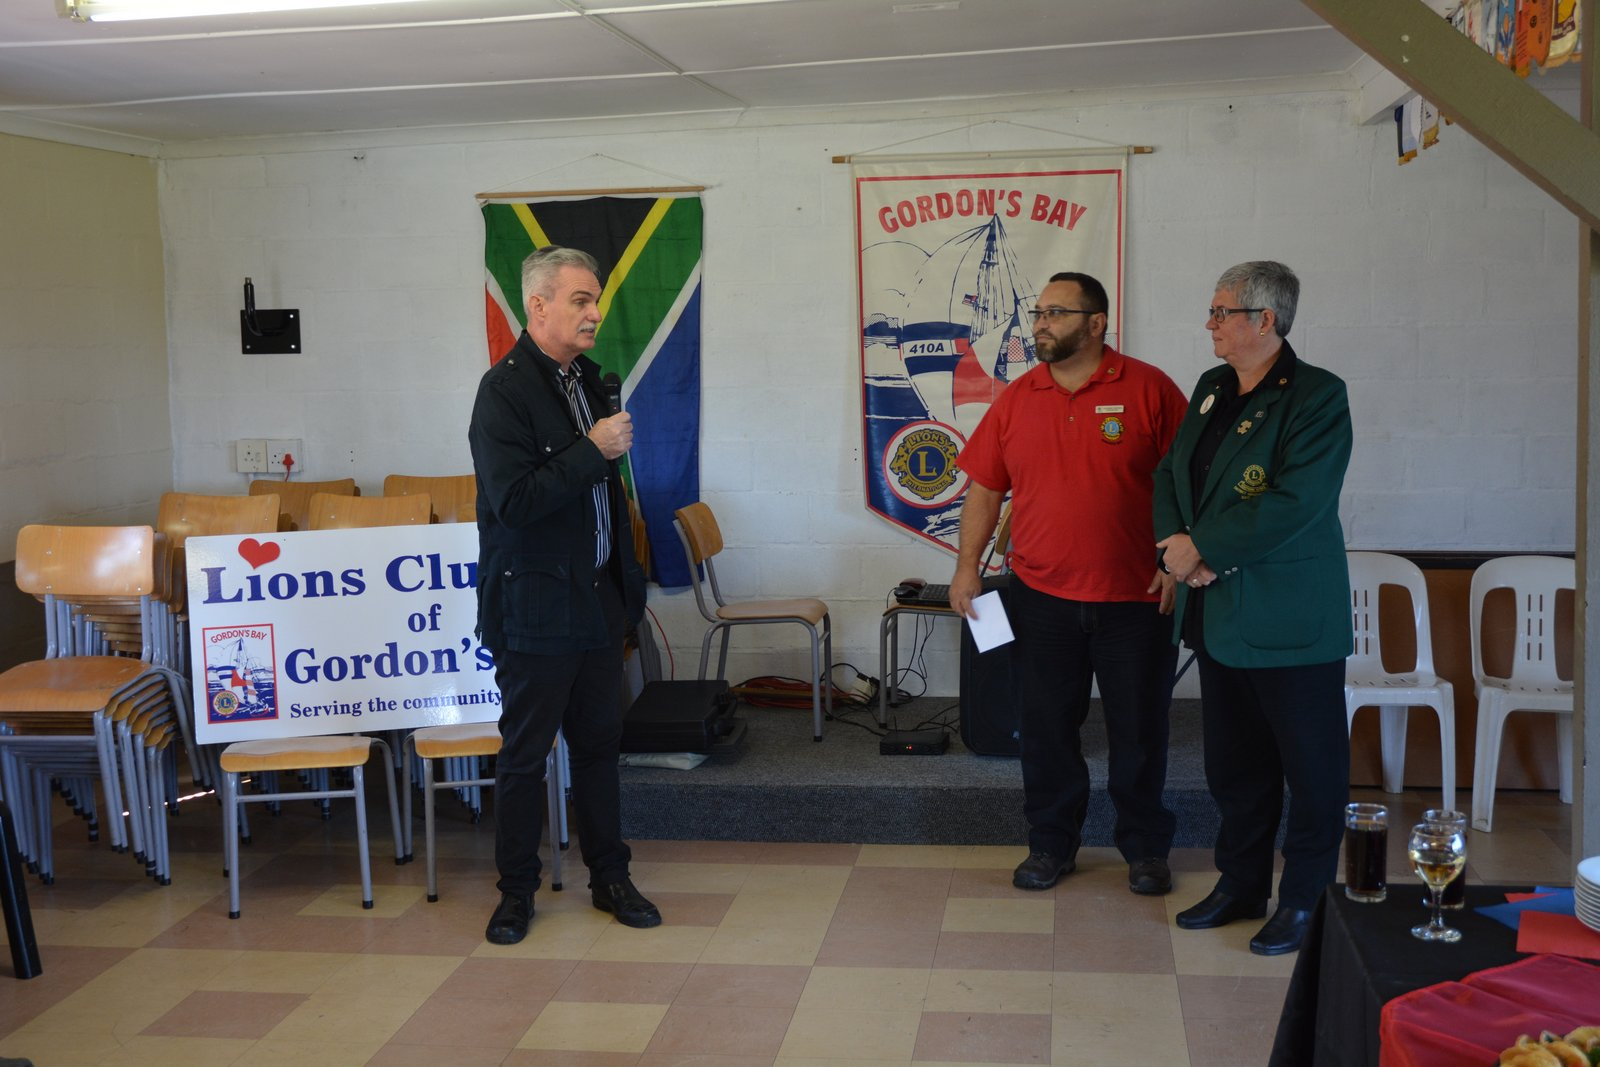 Councillor Johan MIddleton, Grant Jonathan, Geila Wills